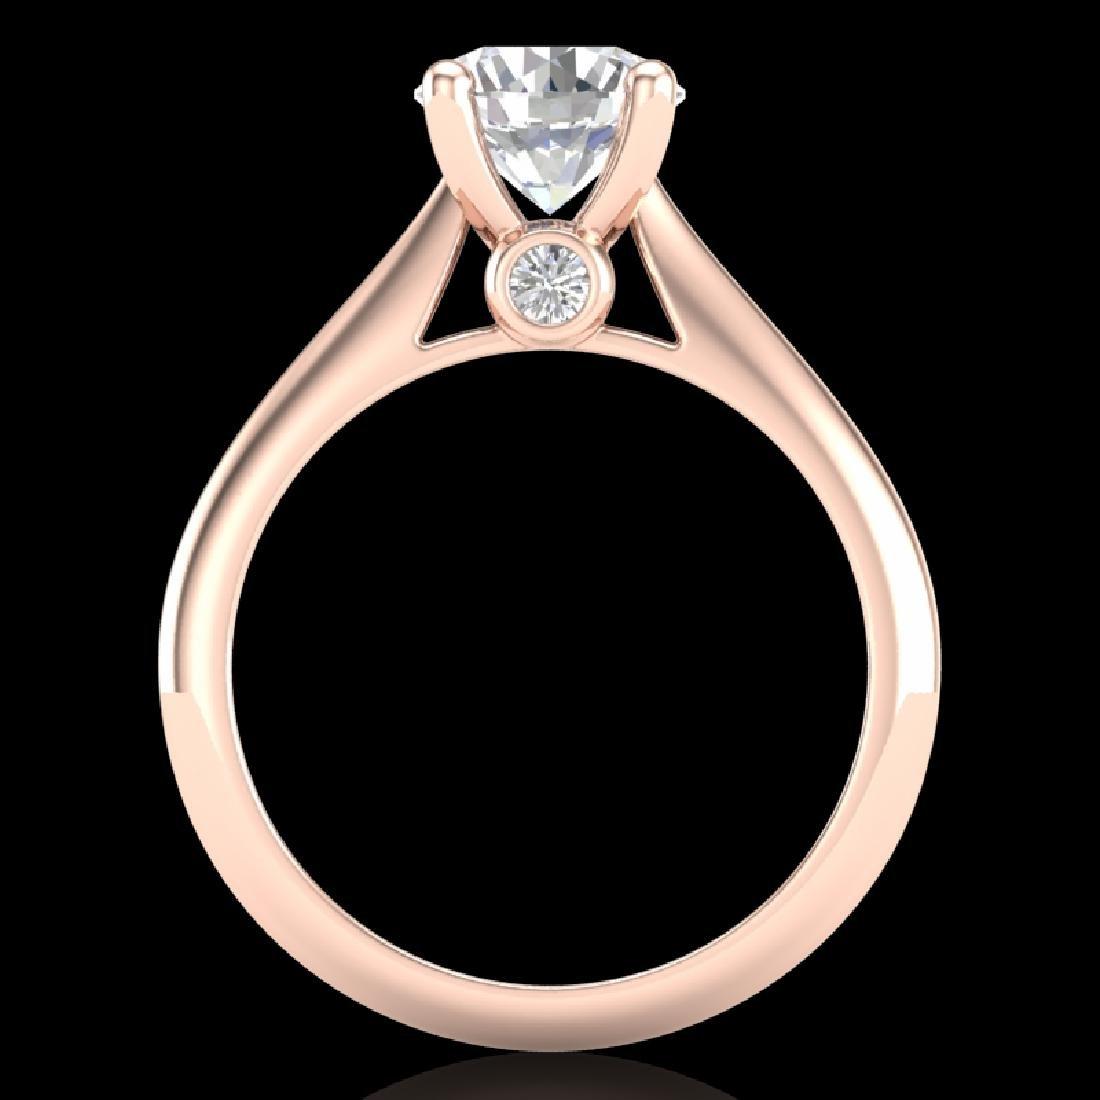 1.6 CTW VS/SI Diamond Art Deco Ring 18K Rose Gold - 3